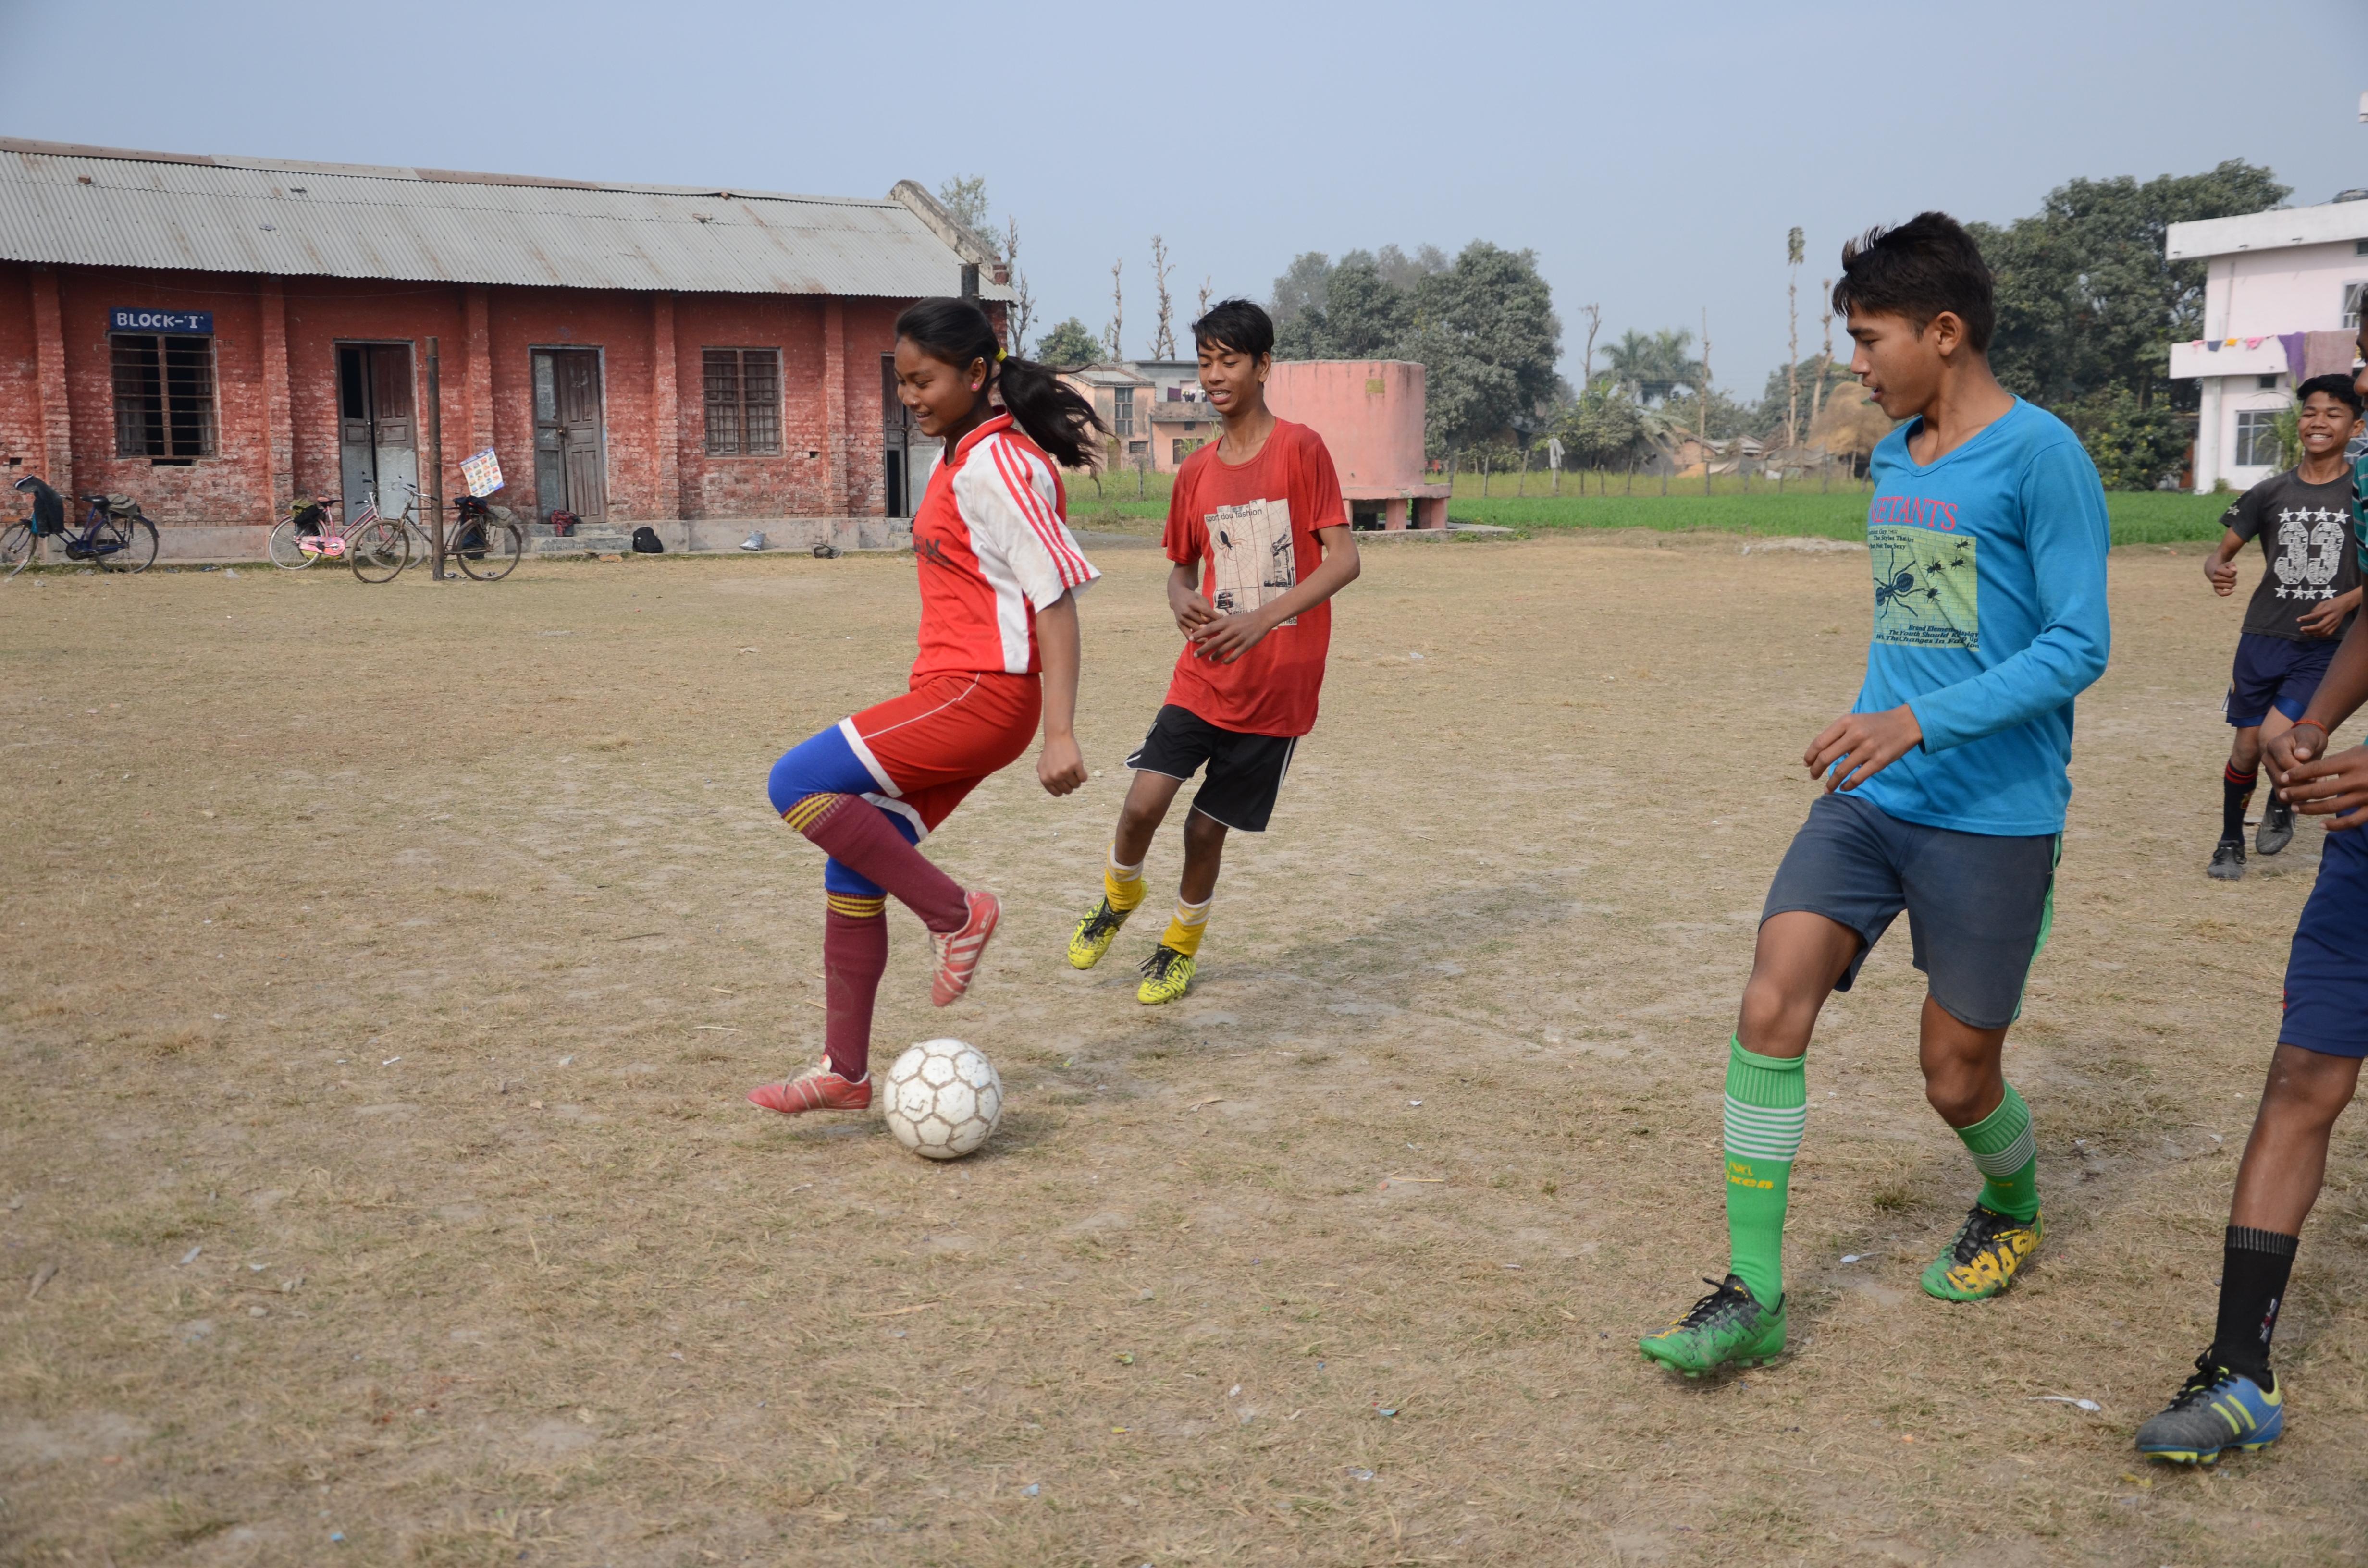 s151194-10-Sumina-Nepal-SKunwar_(18)_720395.JPG